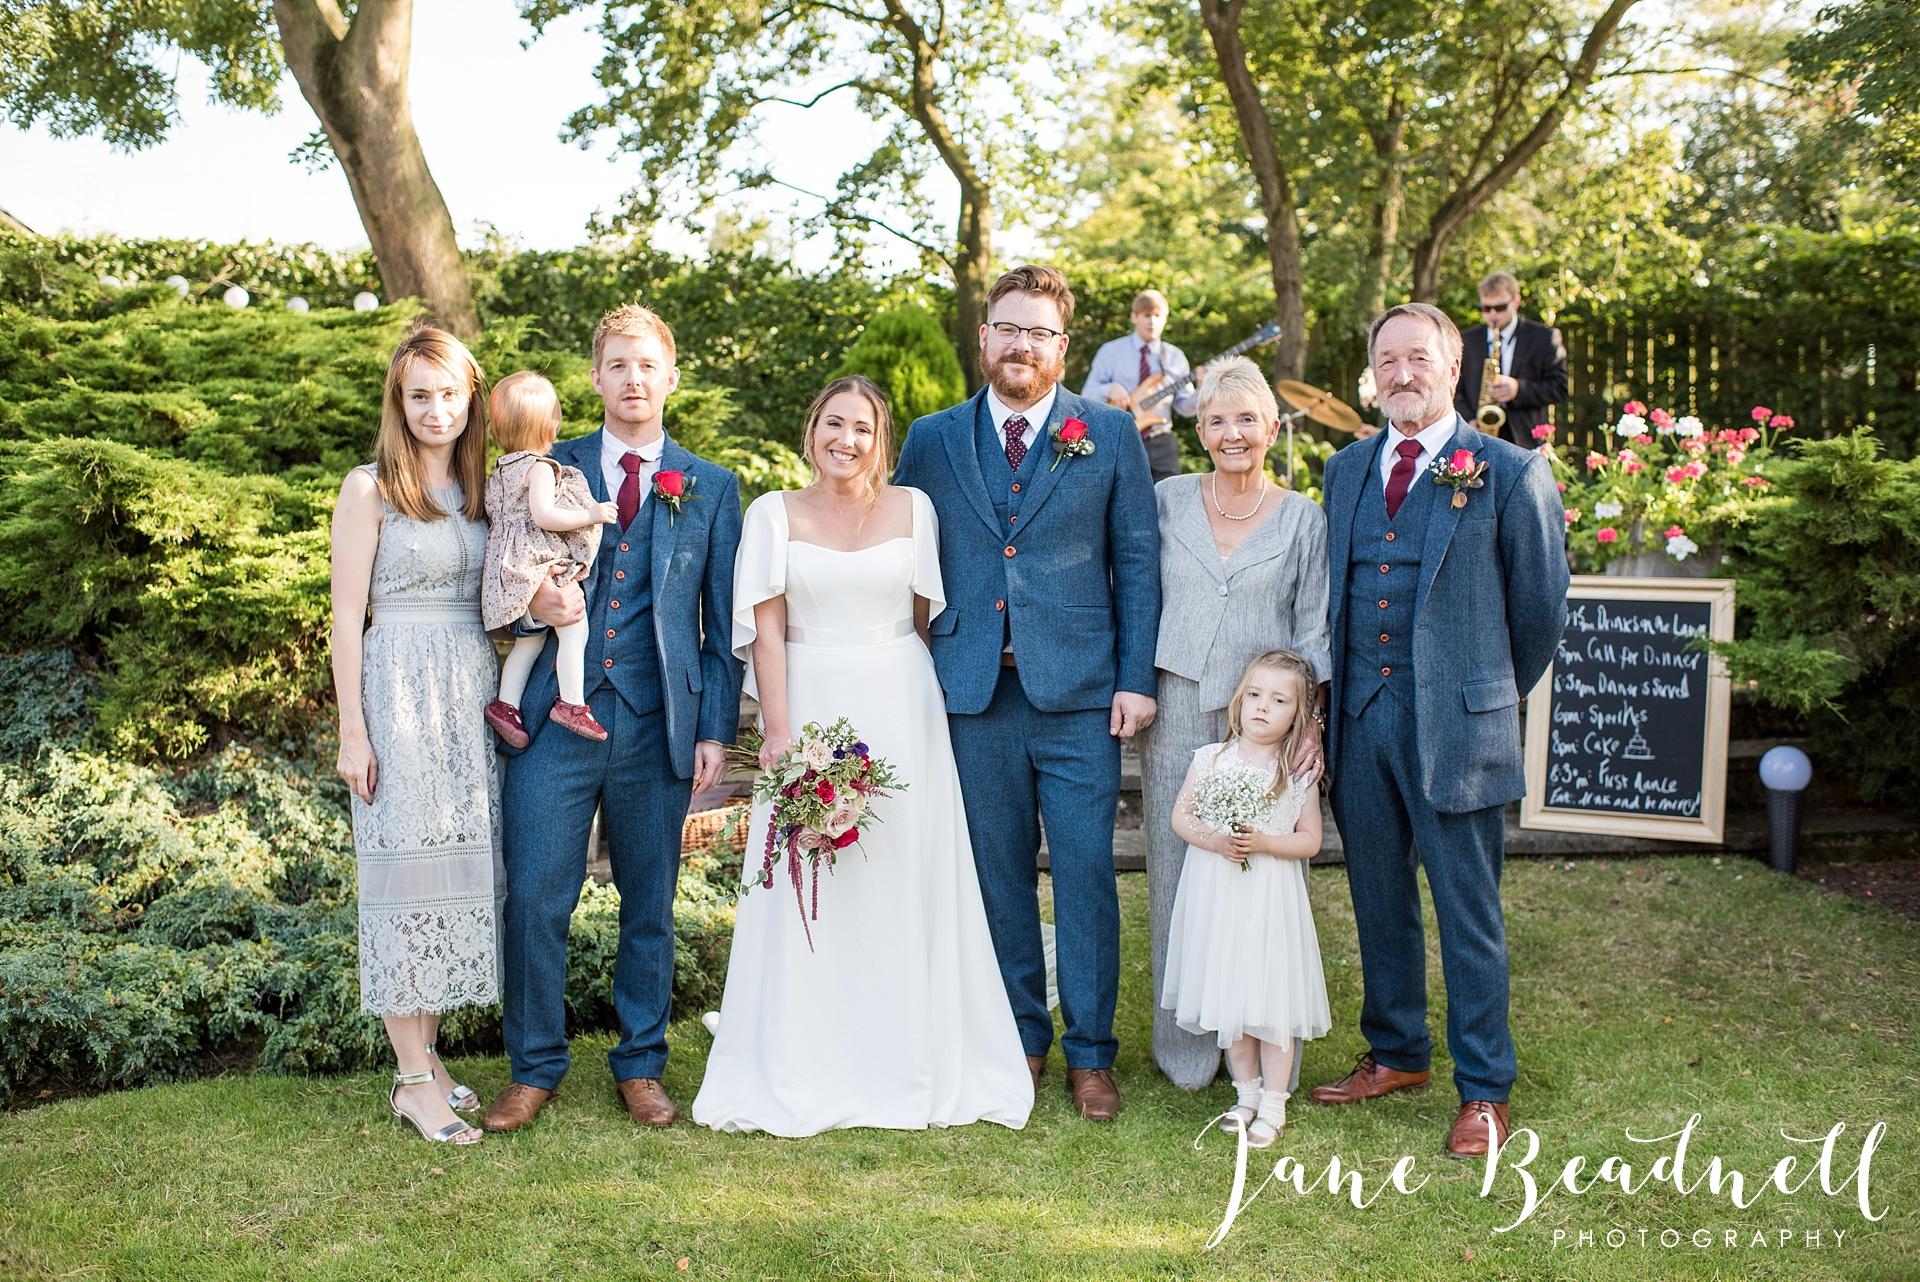 fine-art-wedding-photographer-jane-beadnell-yorkshire-wedding-photographer-garden-wedding_0107